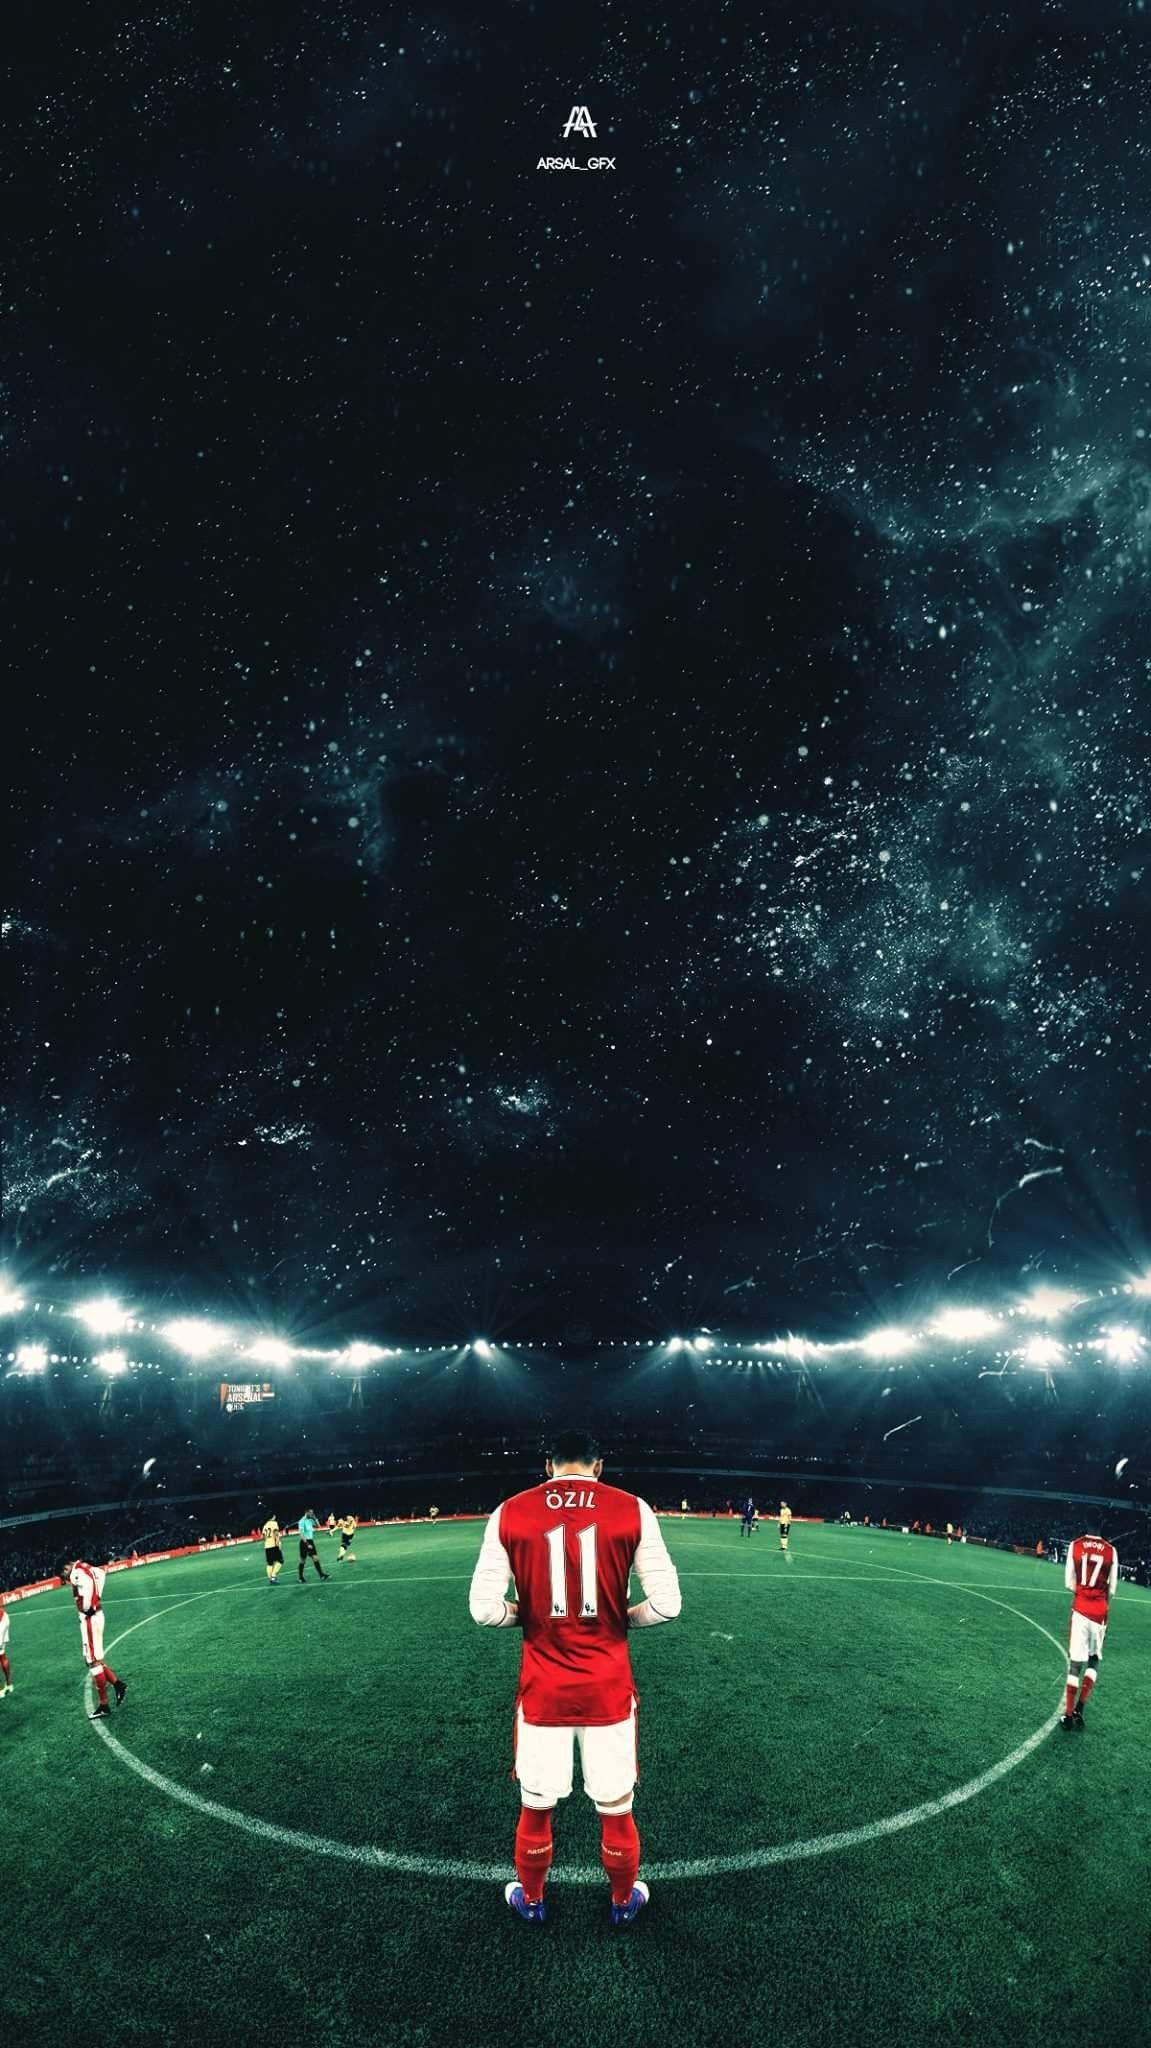 Gunners Arsalfgx Olahraga Sepak Bola Kreatif